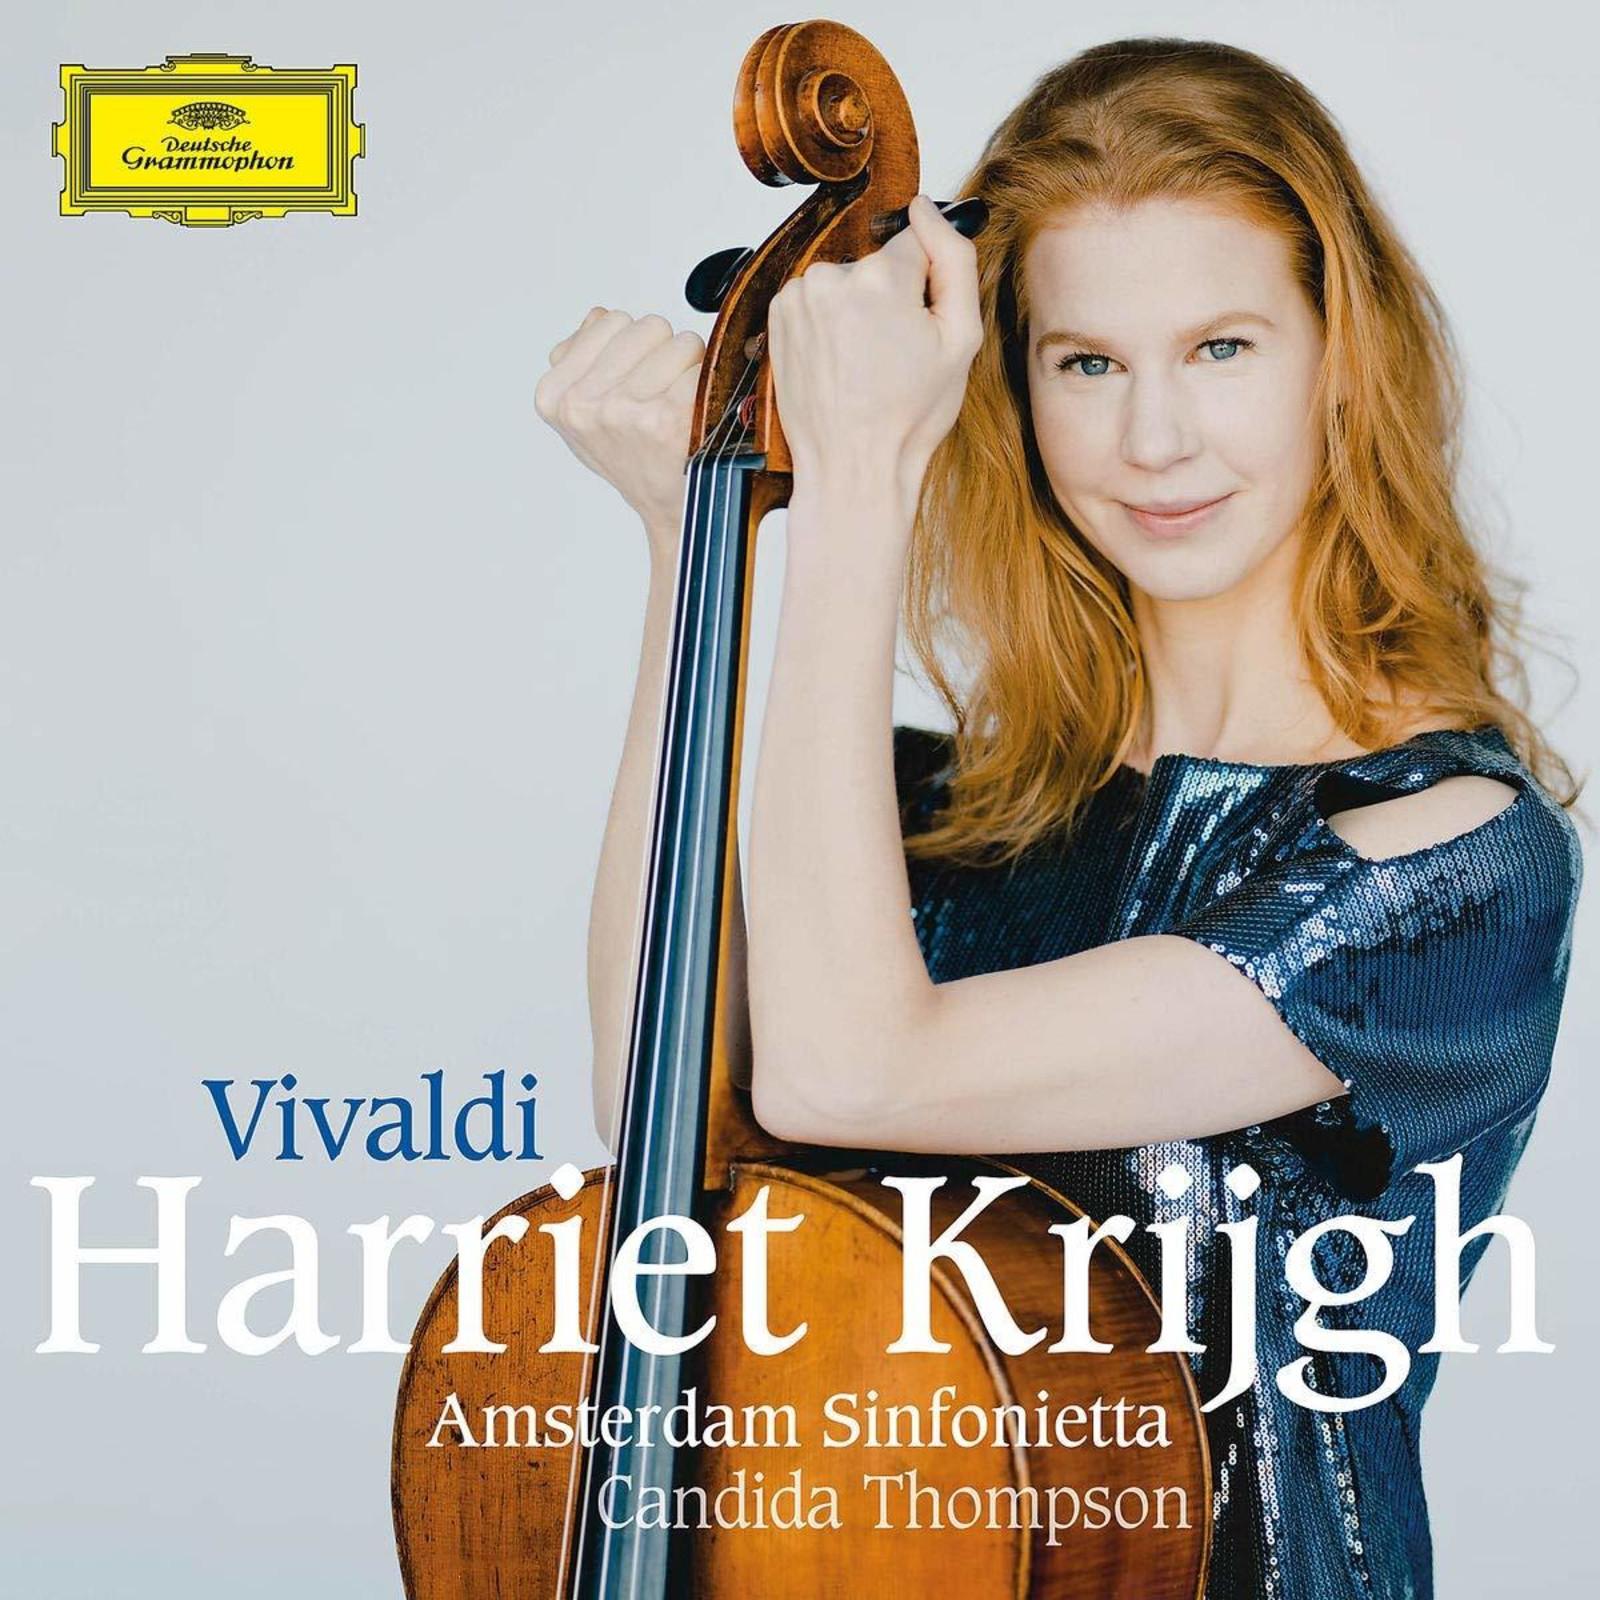 Harriet Krijgh, Candida Thompson & Amsterdam Sinfonietta – Vivaldi